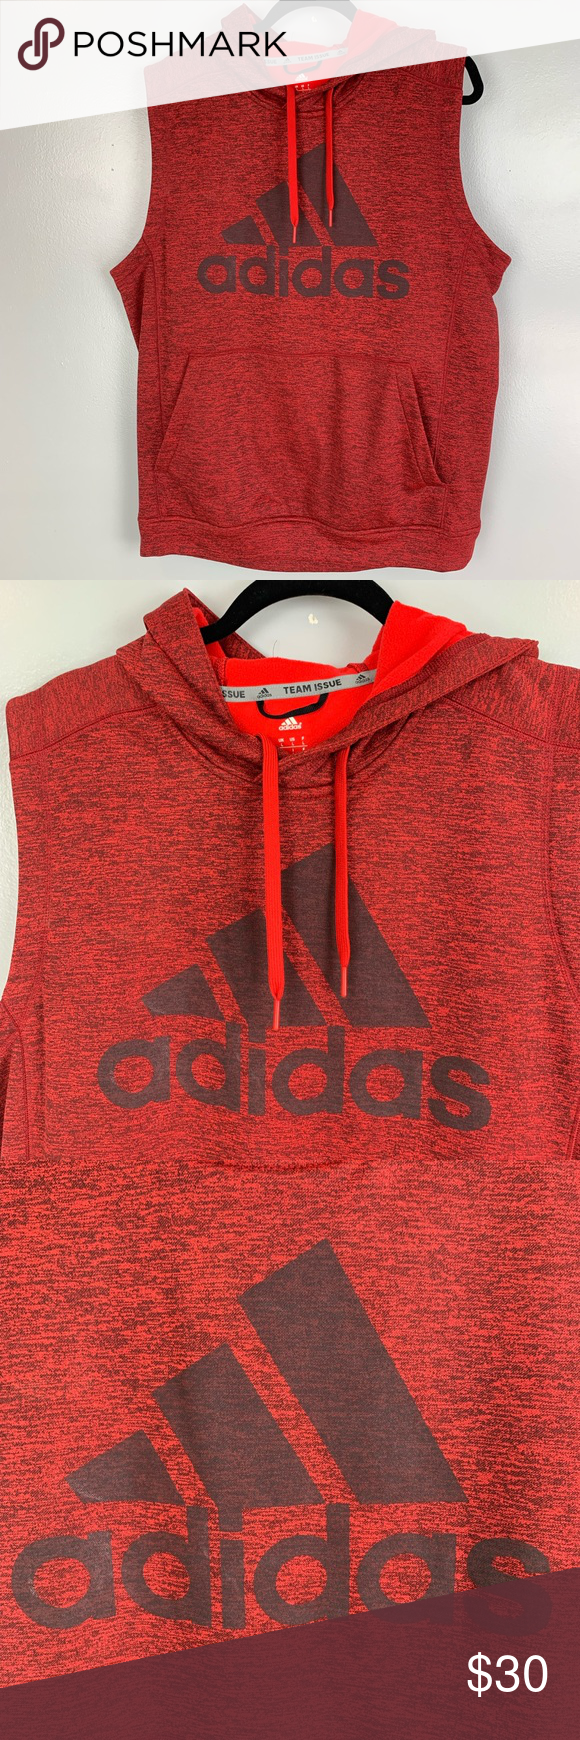 Adidas team issue sleeveless hoodie sweatshirt (With images